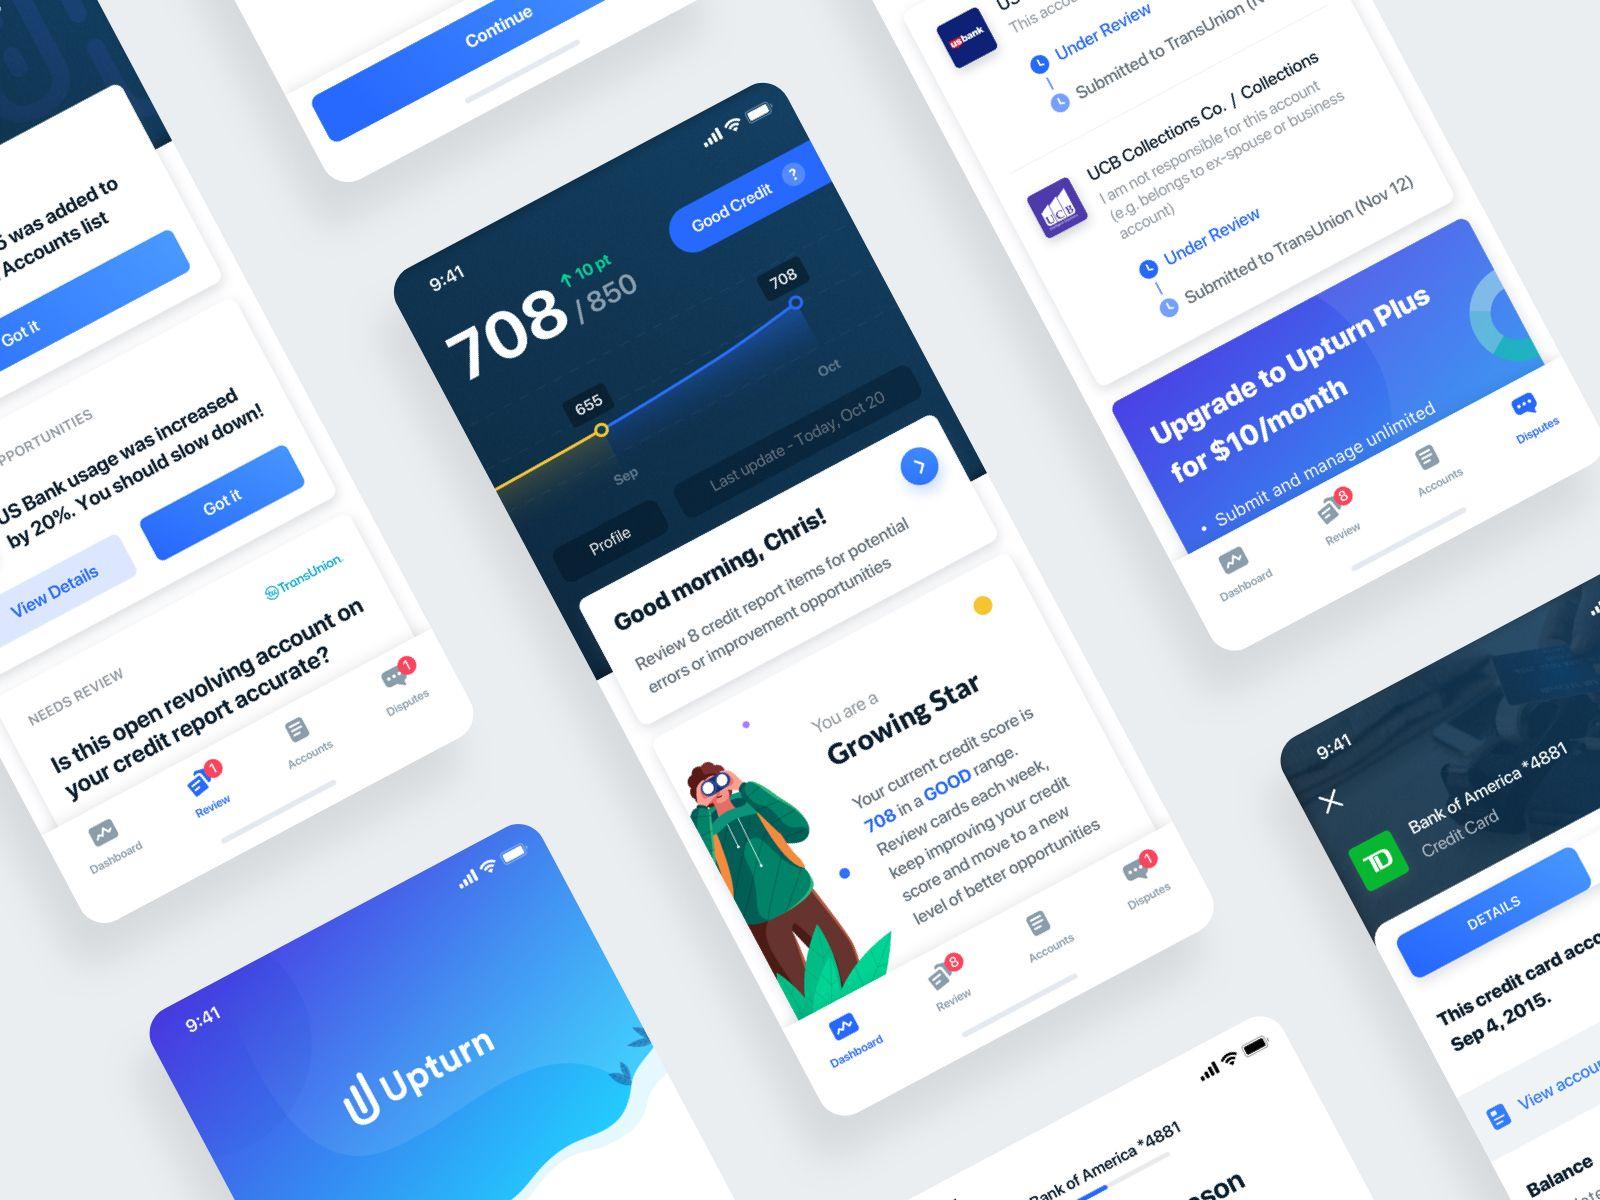 Review And Dispute Your Credit Report App Design Credit Score